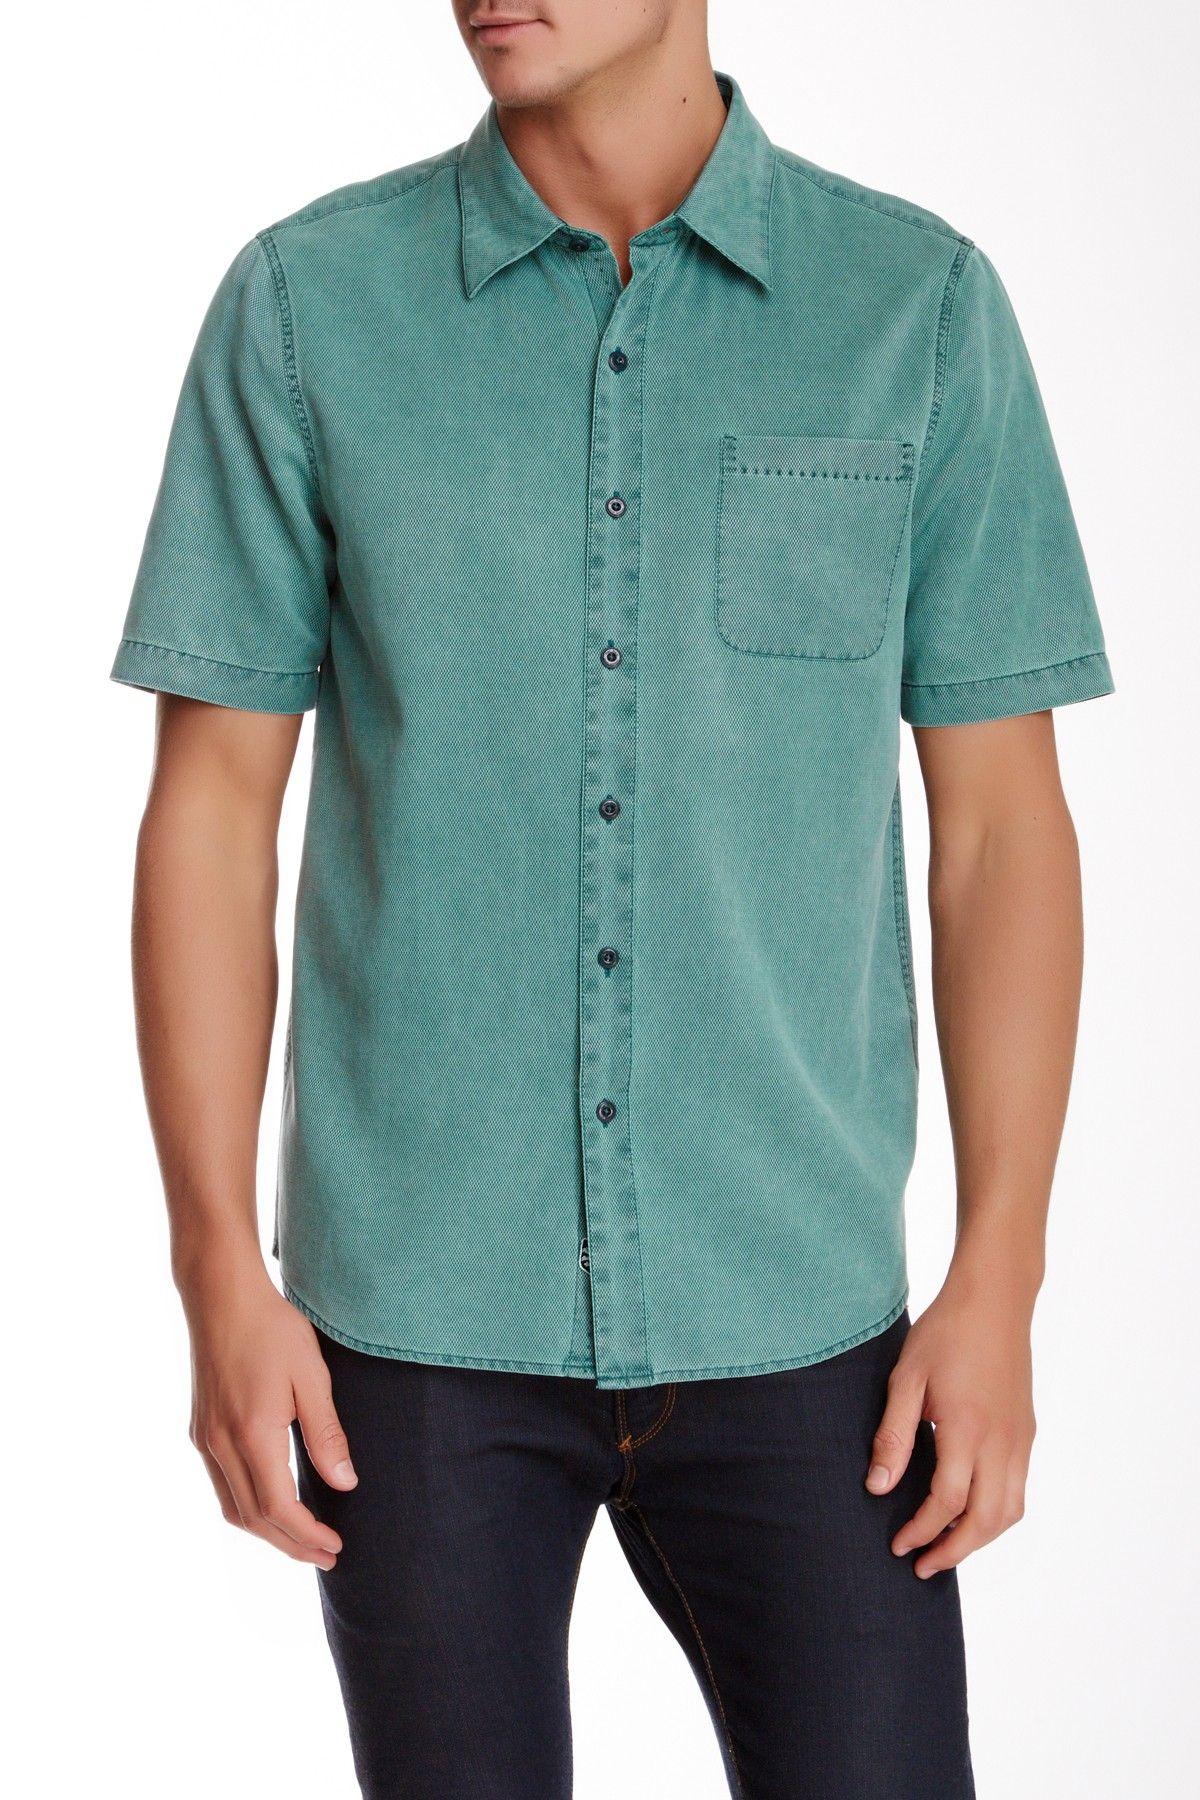 Havana Cloth Silk Blend Shirt by Nat Nast on @nordstrom_rack